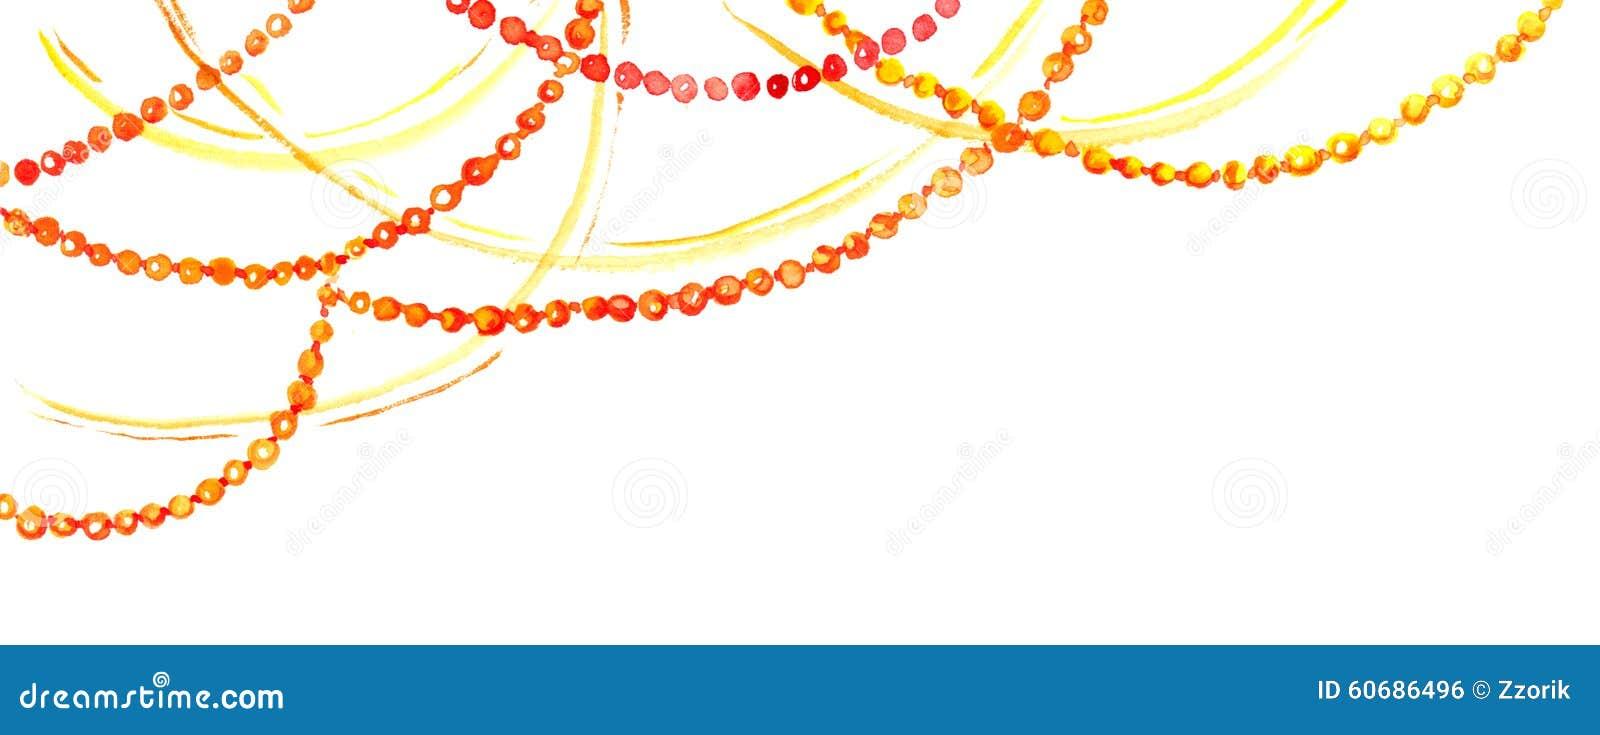 holiday decorative garland watercolor border frame